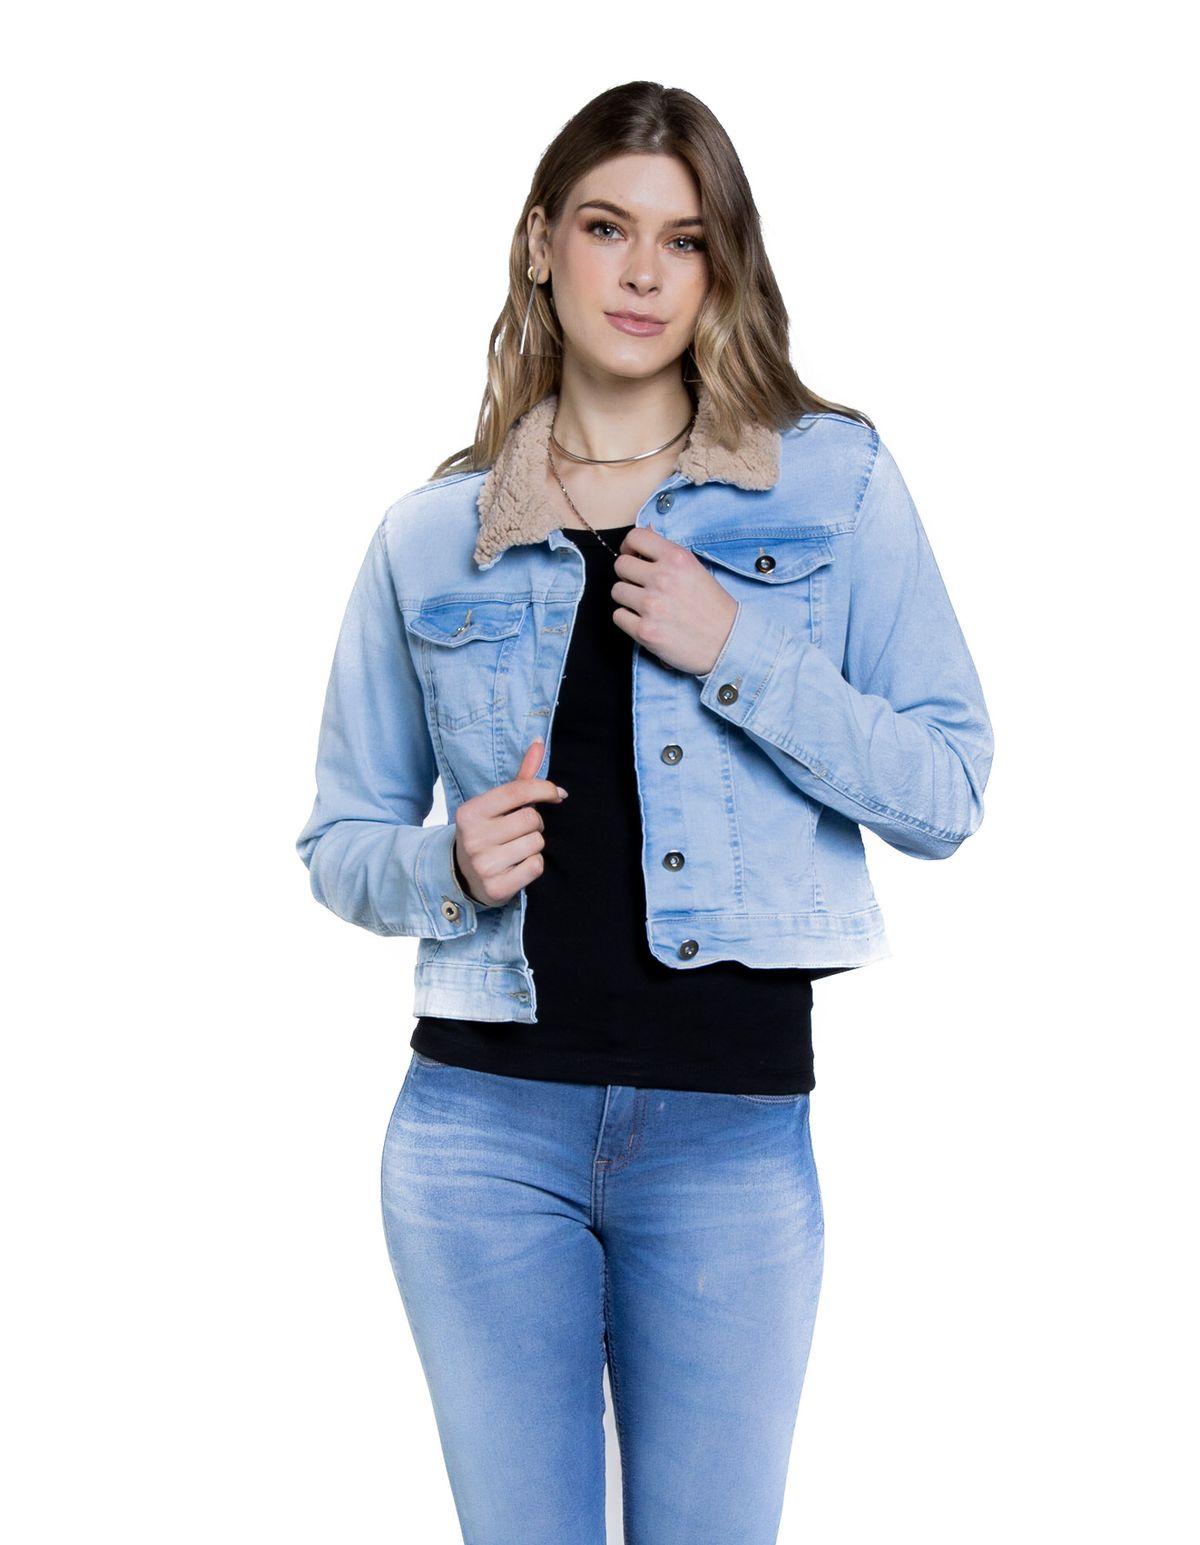 593424002-jaqueta-jeans-claro-feminina-gola-pelo-jeans-claro-m-acf